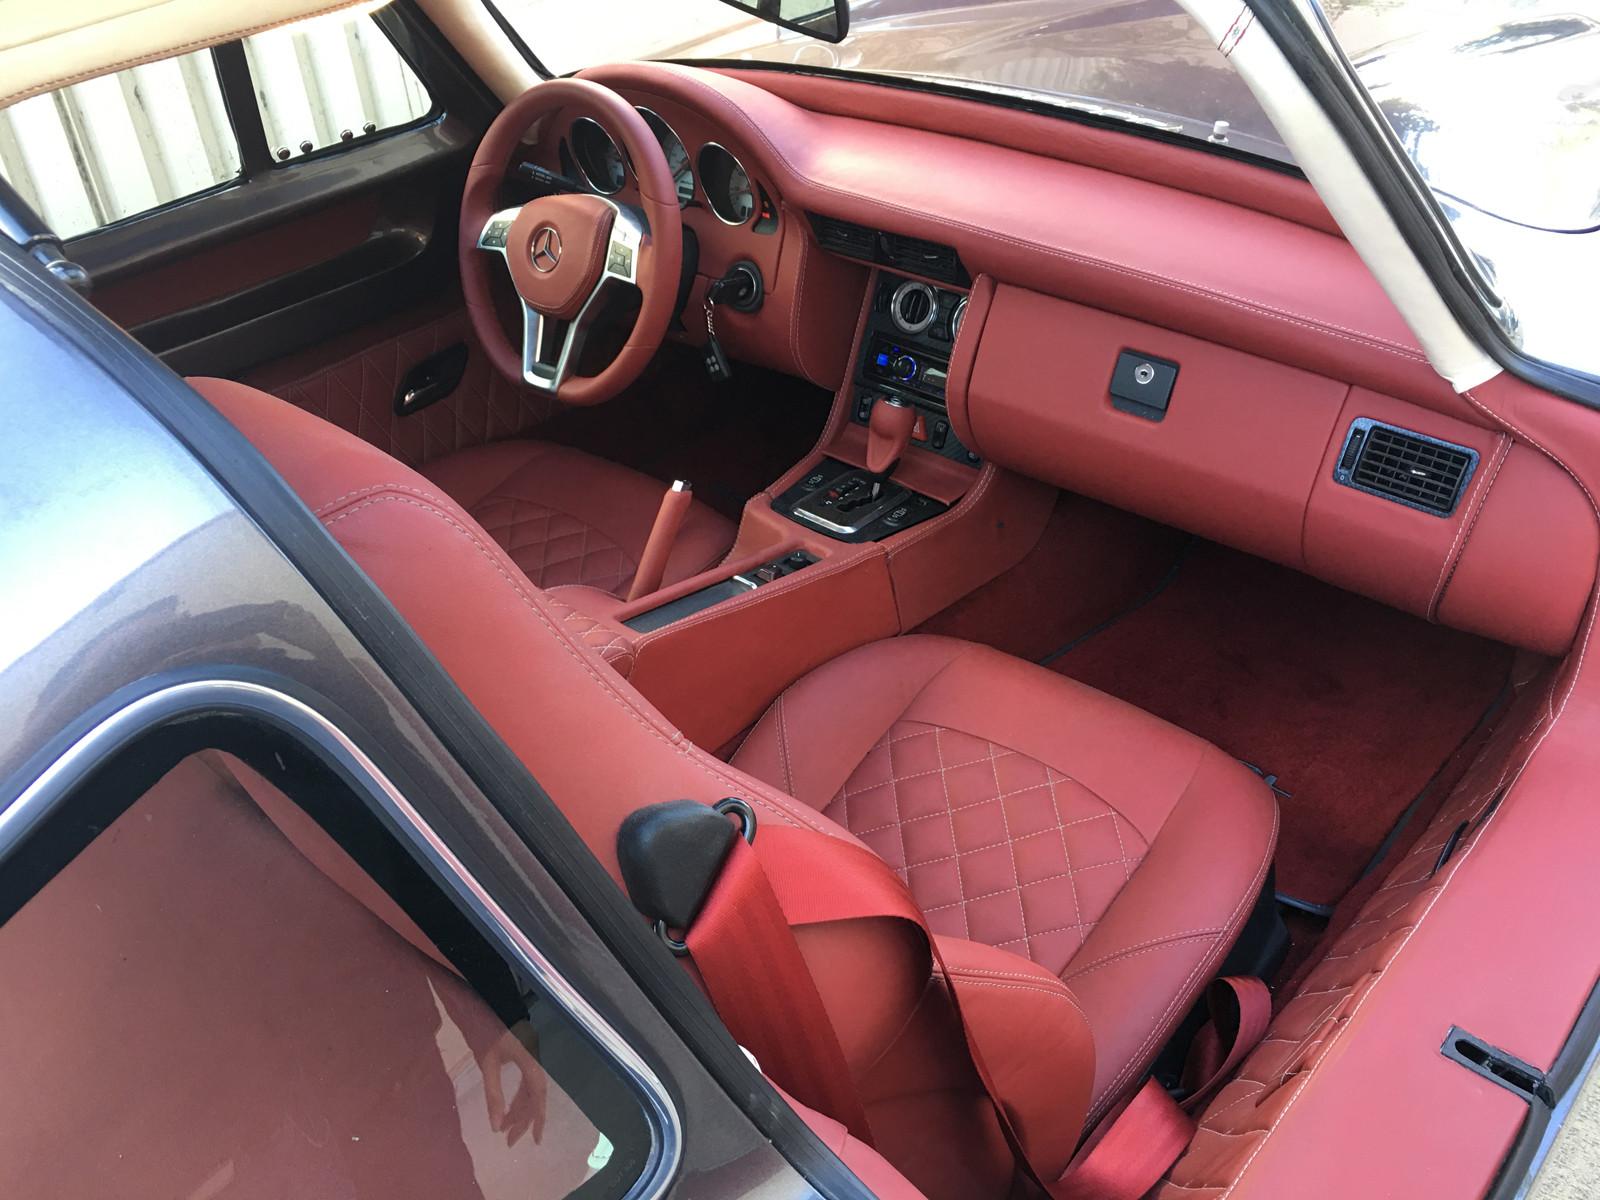 Foto de Réplica Mercedes-Benz 300 SL Gullwing base SLK AMG (3/10)